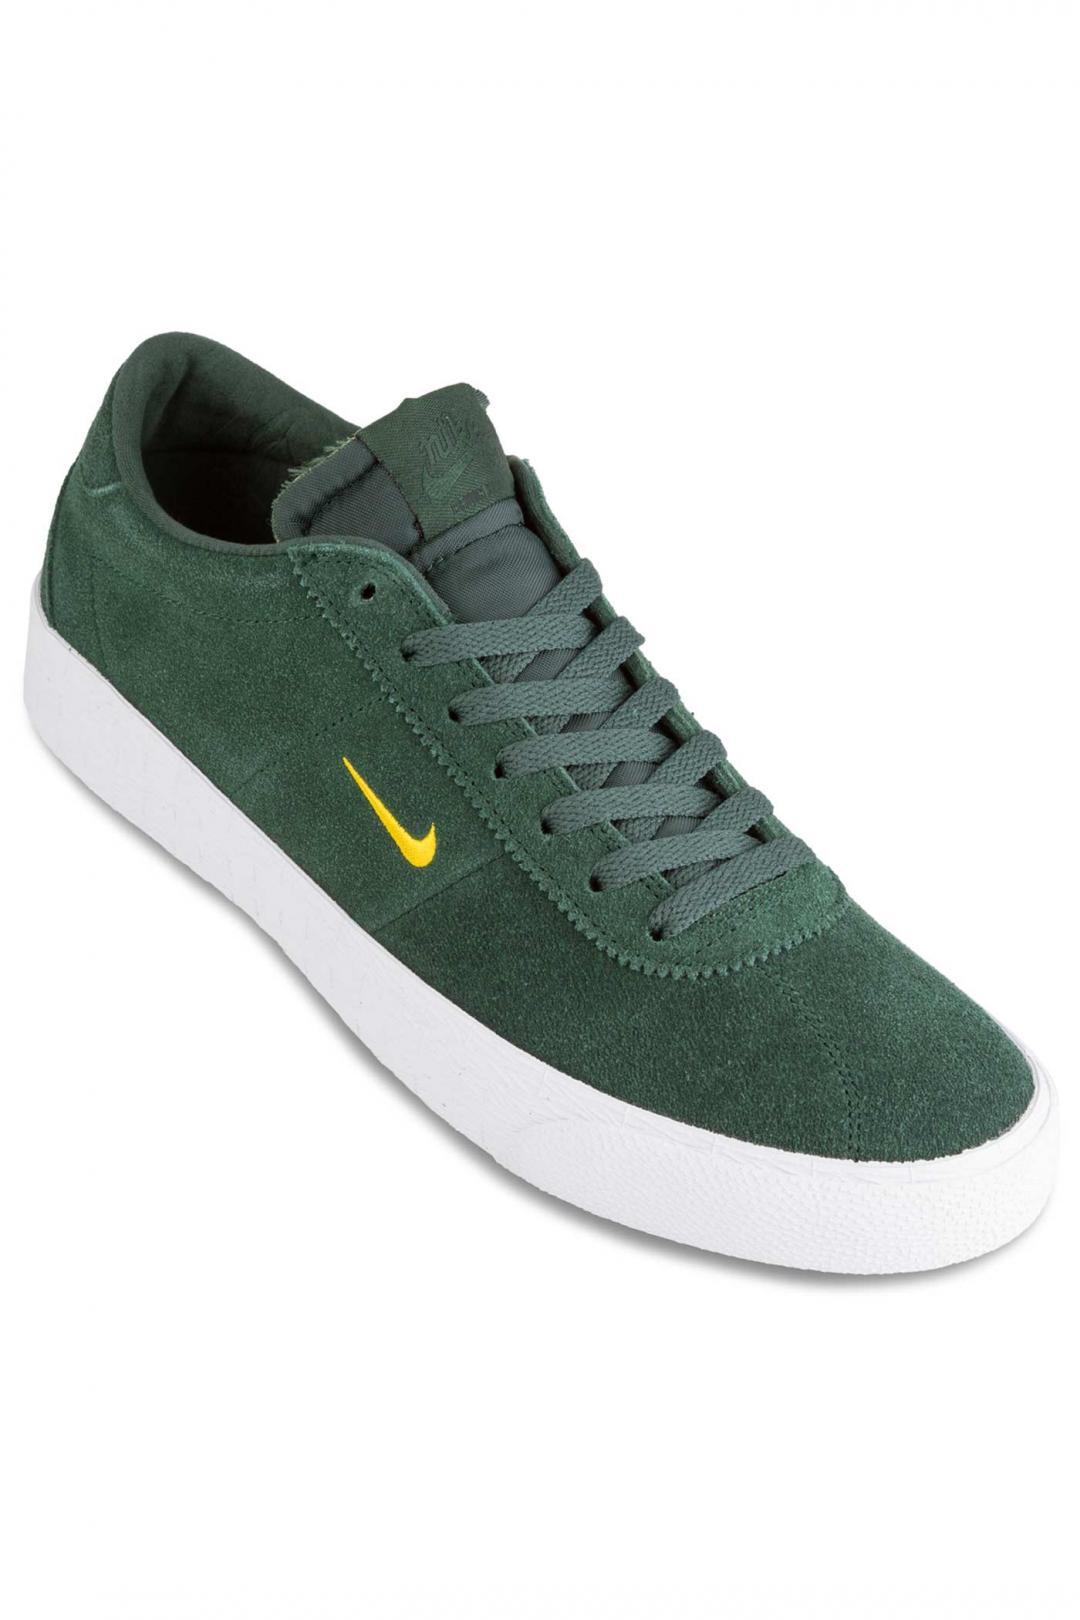 Uomo Nike SB Zoom Bruin Ultra midnight green habanero red | Scarpe da skate